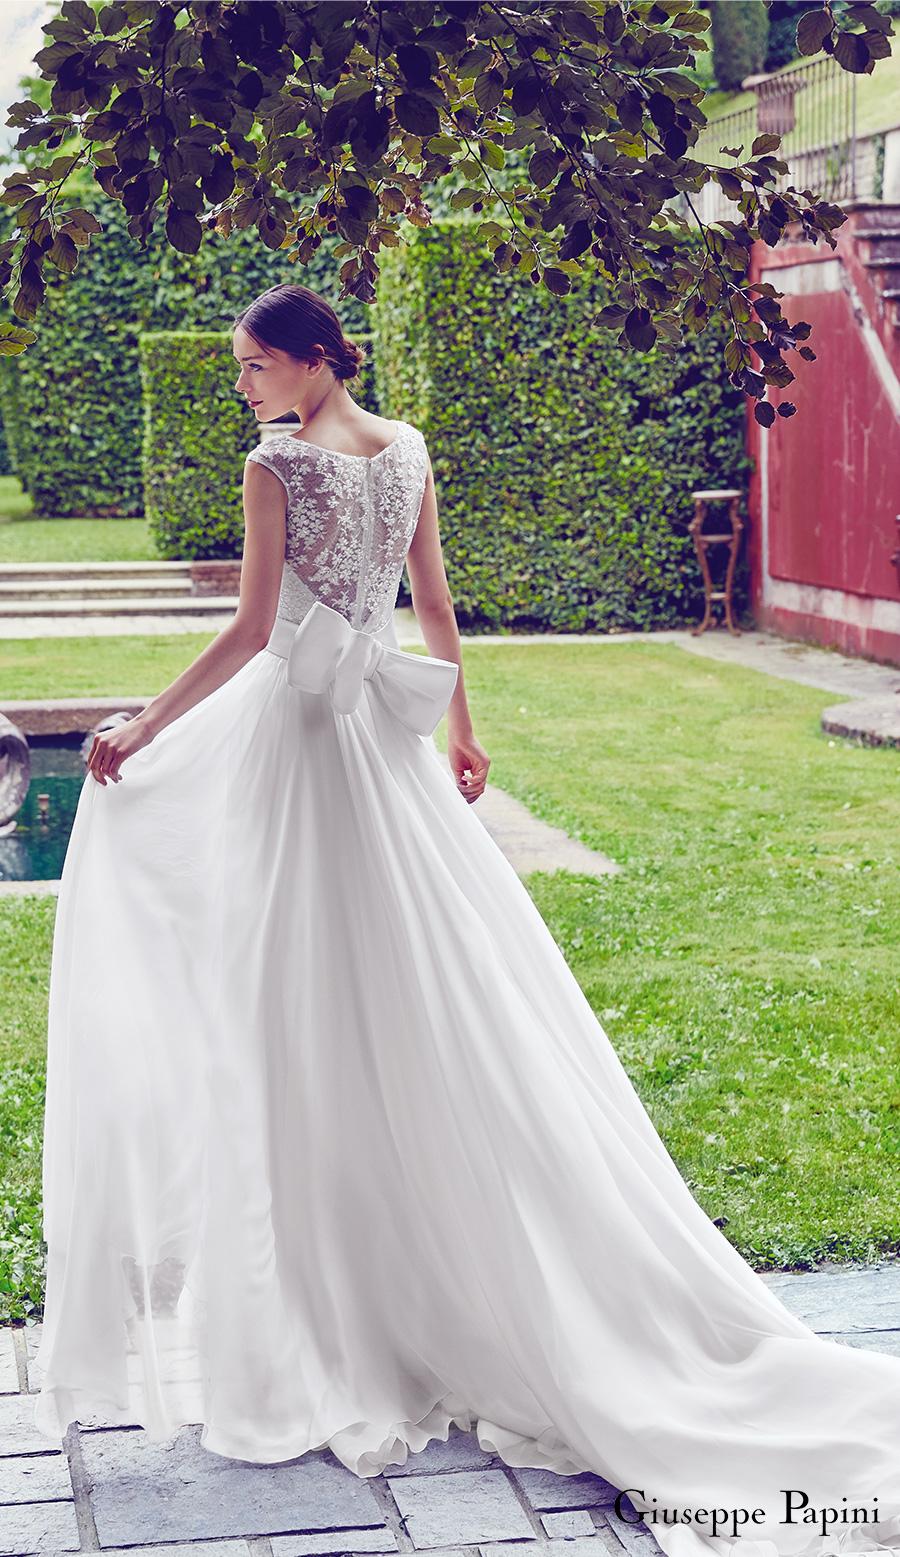 giuseppe papini 2017 (portofino) cap sleeve illusion back a line wedding dress bv romantic